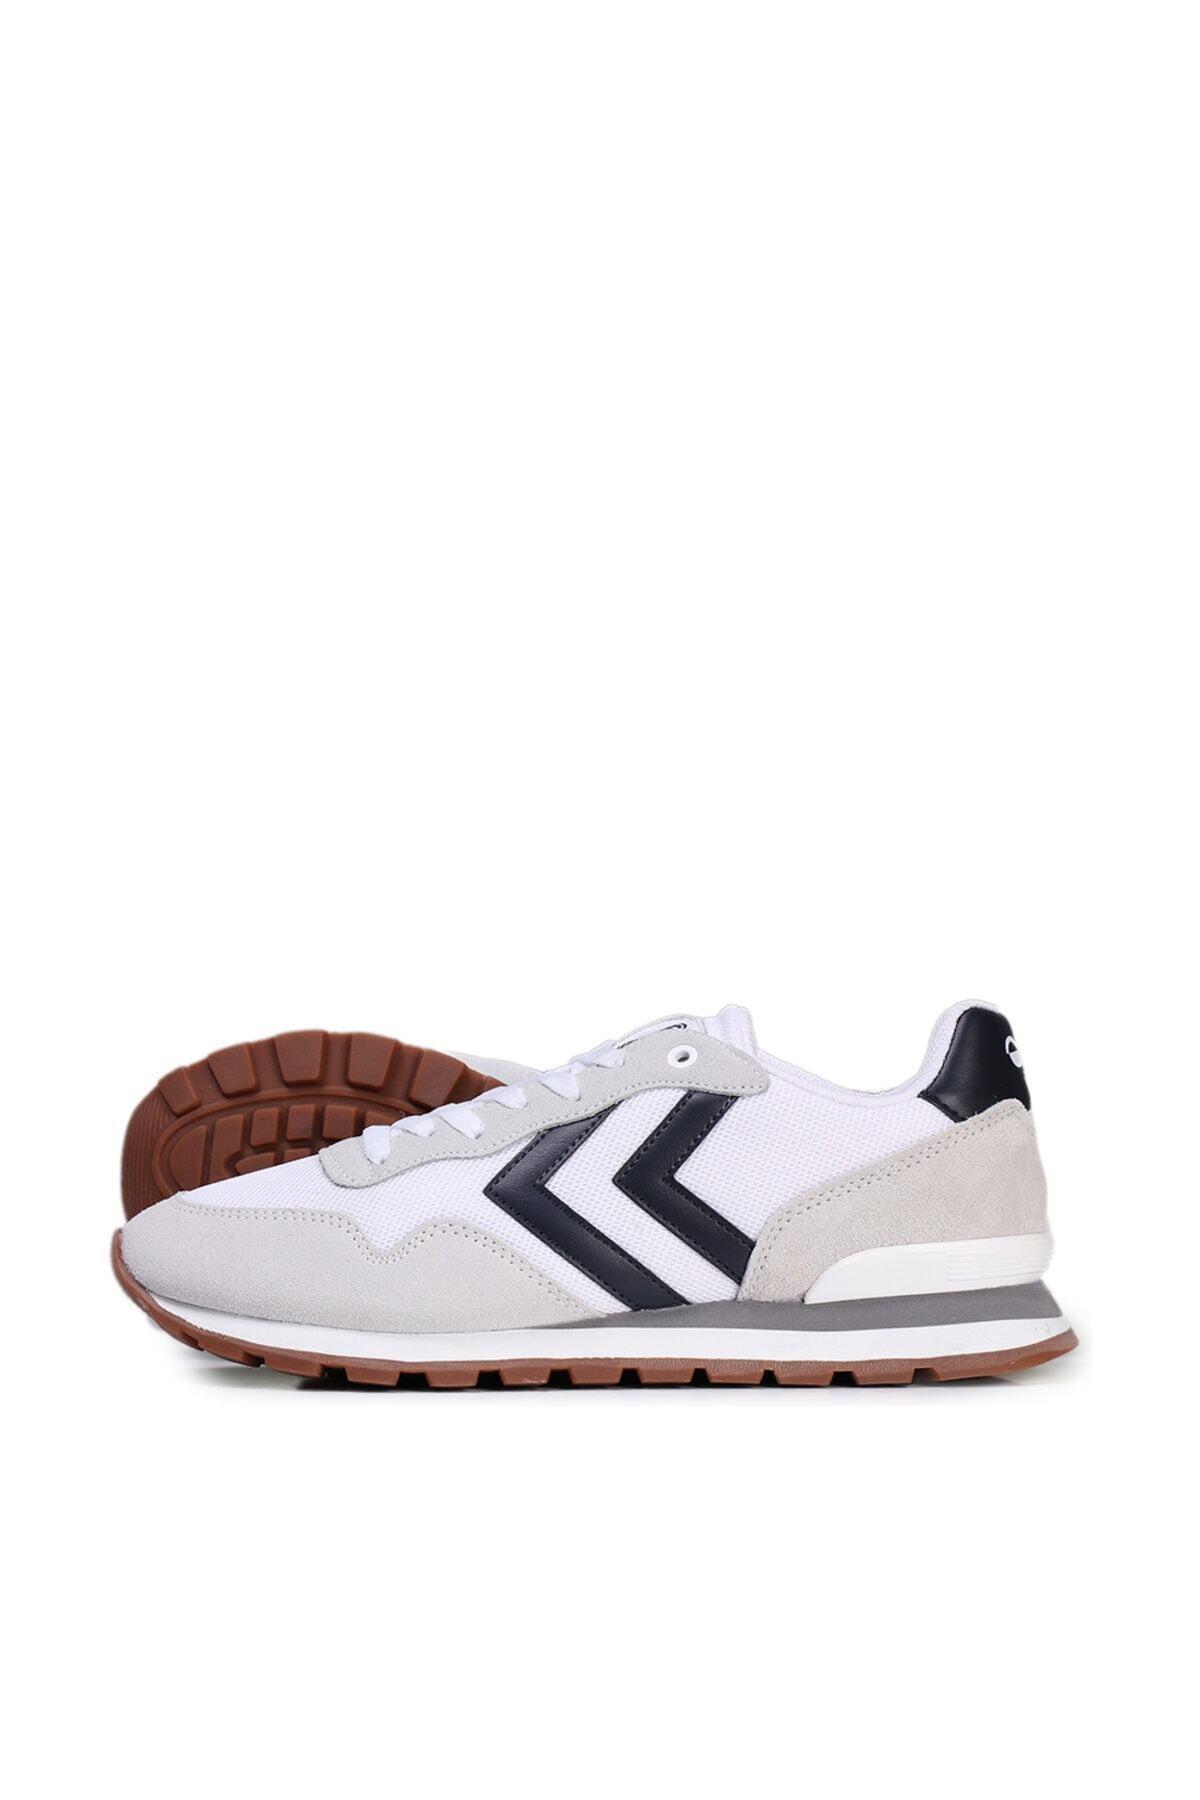 HUMMEL HMLTHOR LIFESTYLE SHOES Gri Erkek Sneaker Ayakkabı 100406430 1